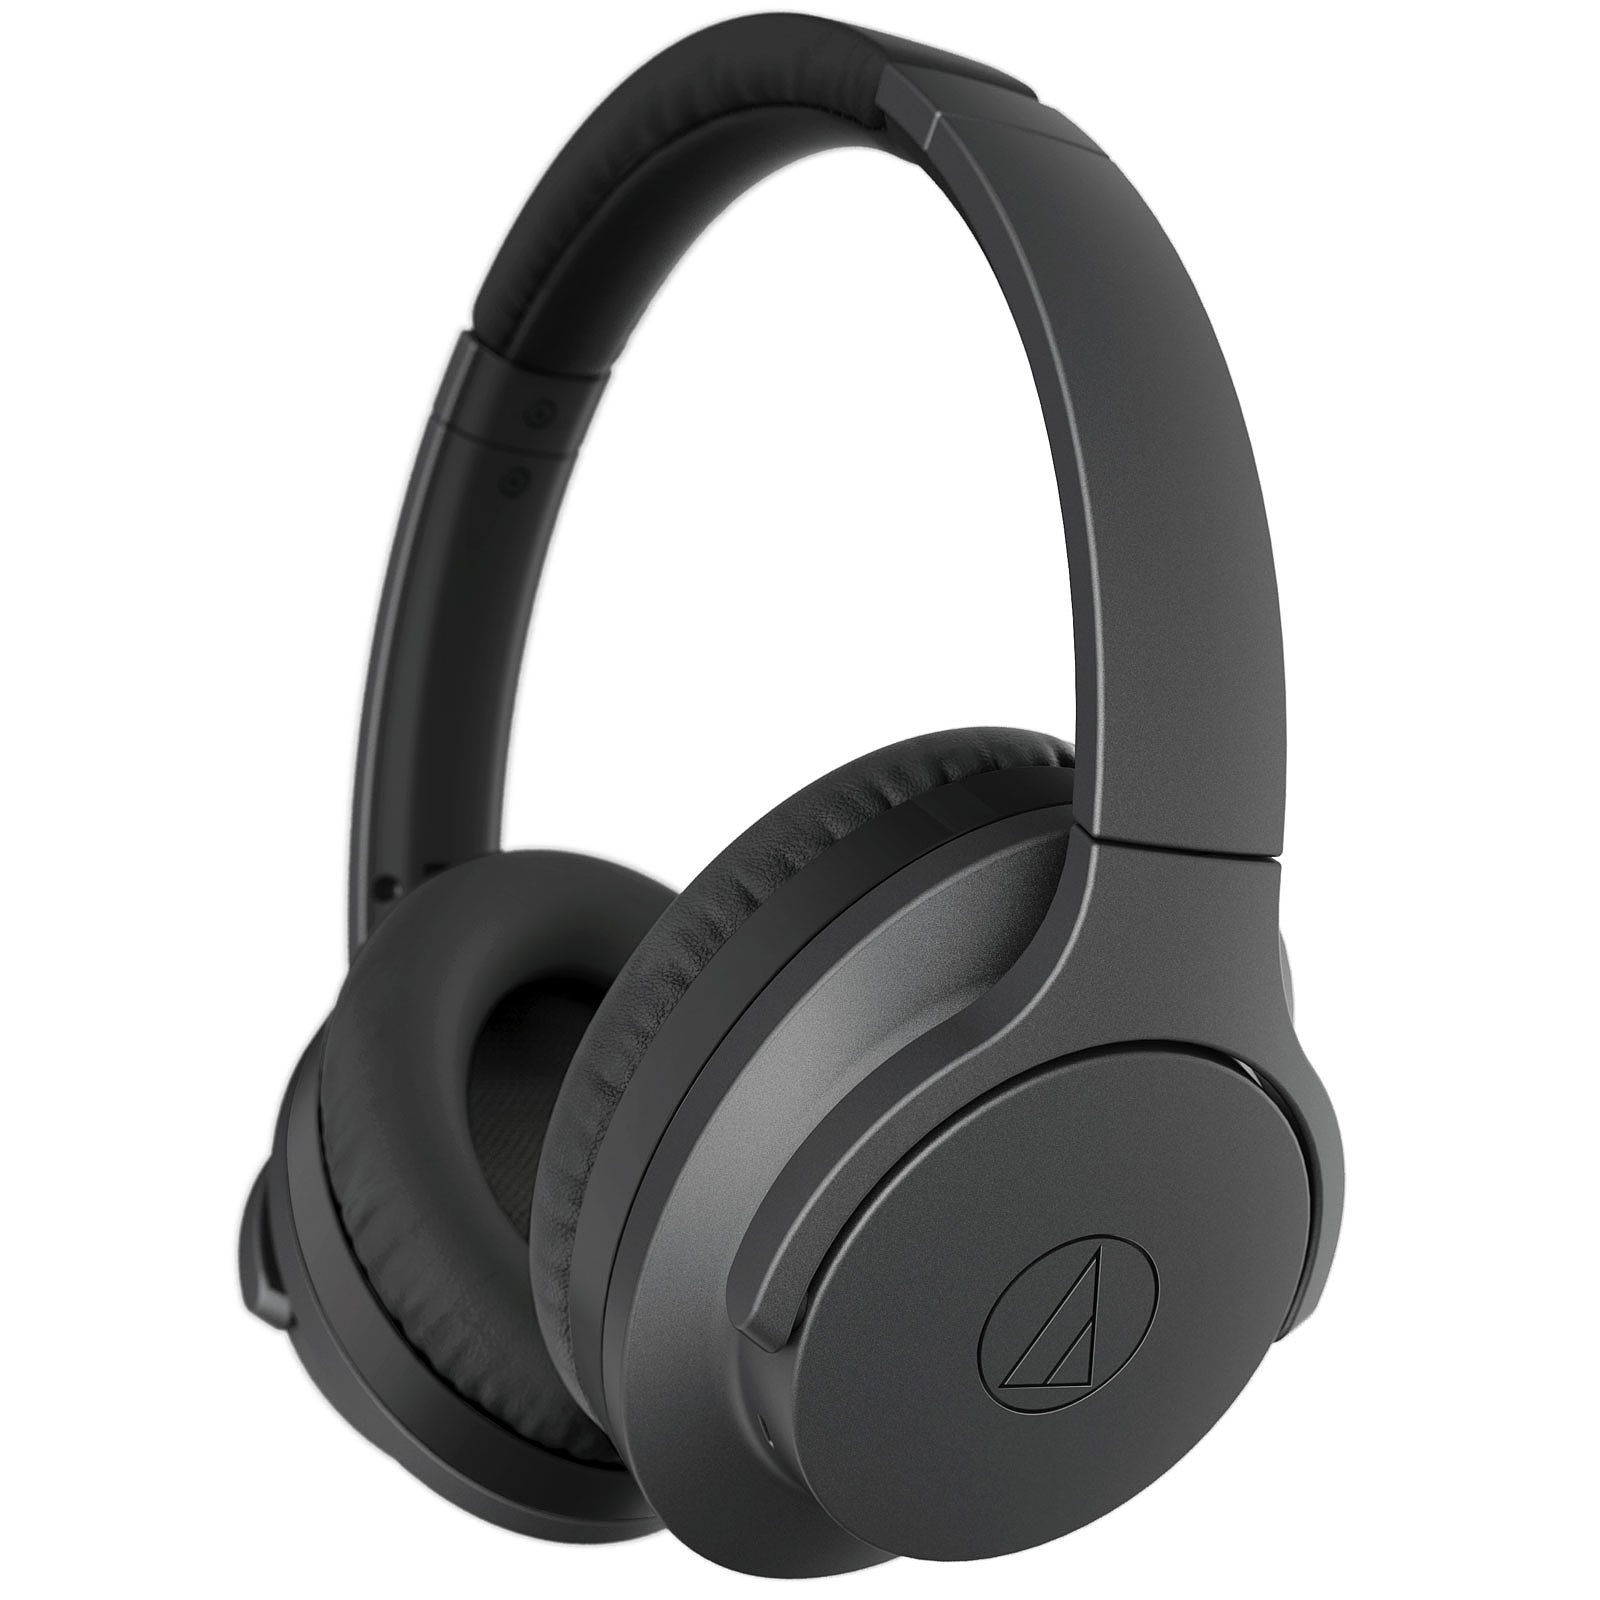 Audio-Technica ATH-ANC700BT Noir